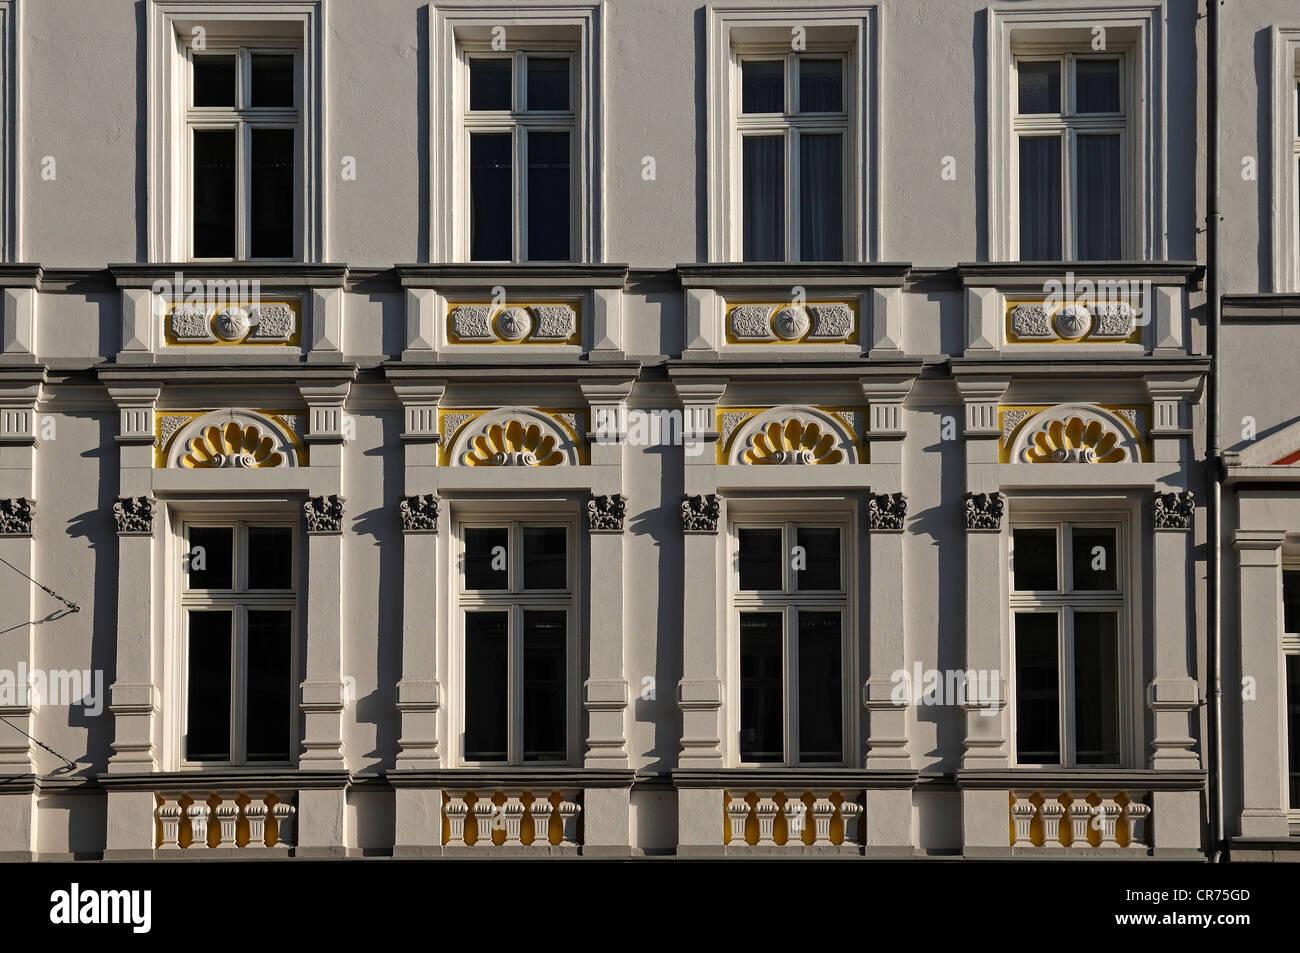 Townhouse decorativa fachada del siglo XIX, Mecklenburgstrasse 14, Schwerin, Mecklemburgo-Pomerania Occidental Foto de stock